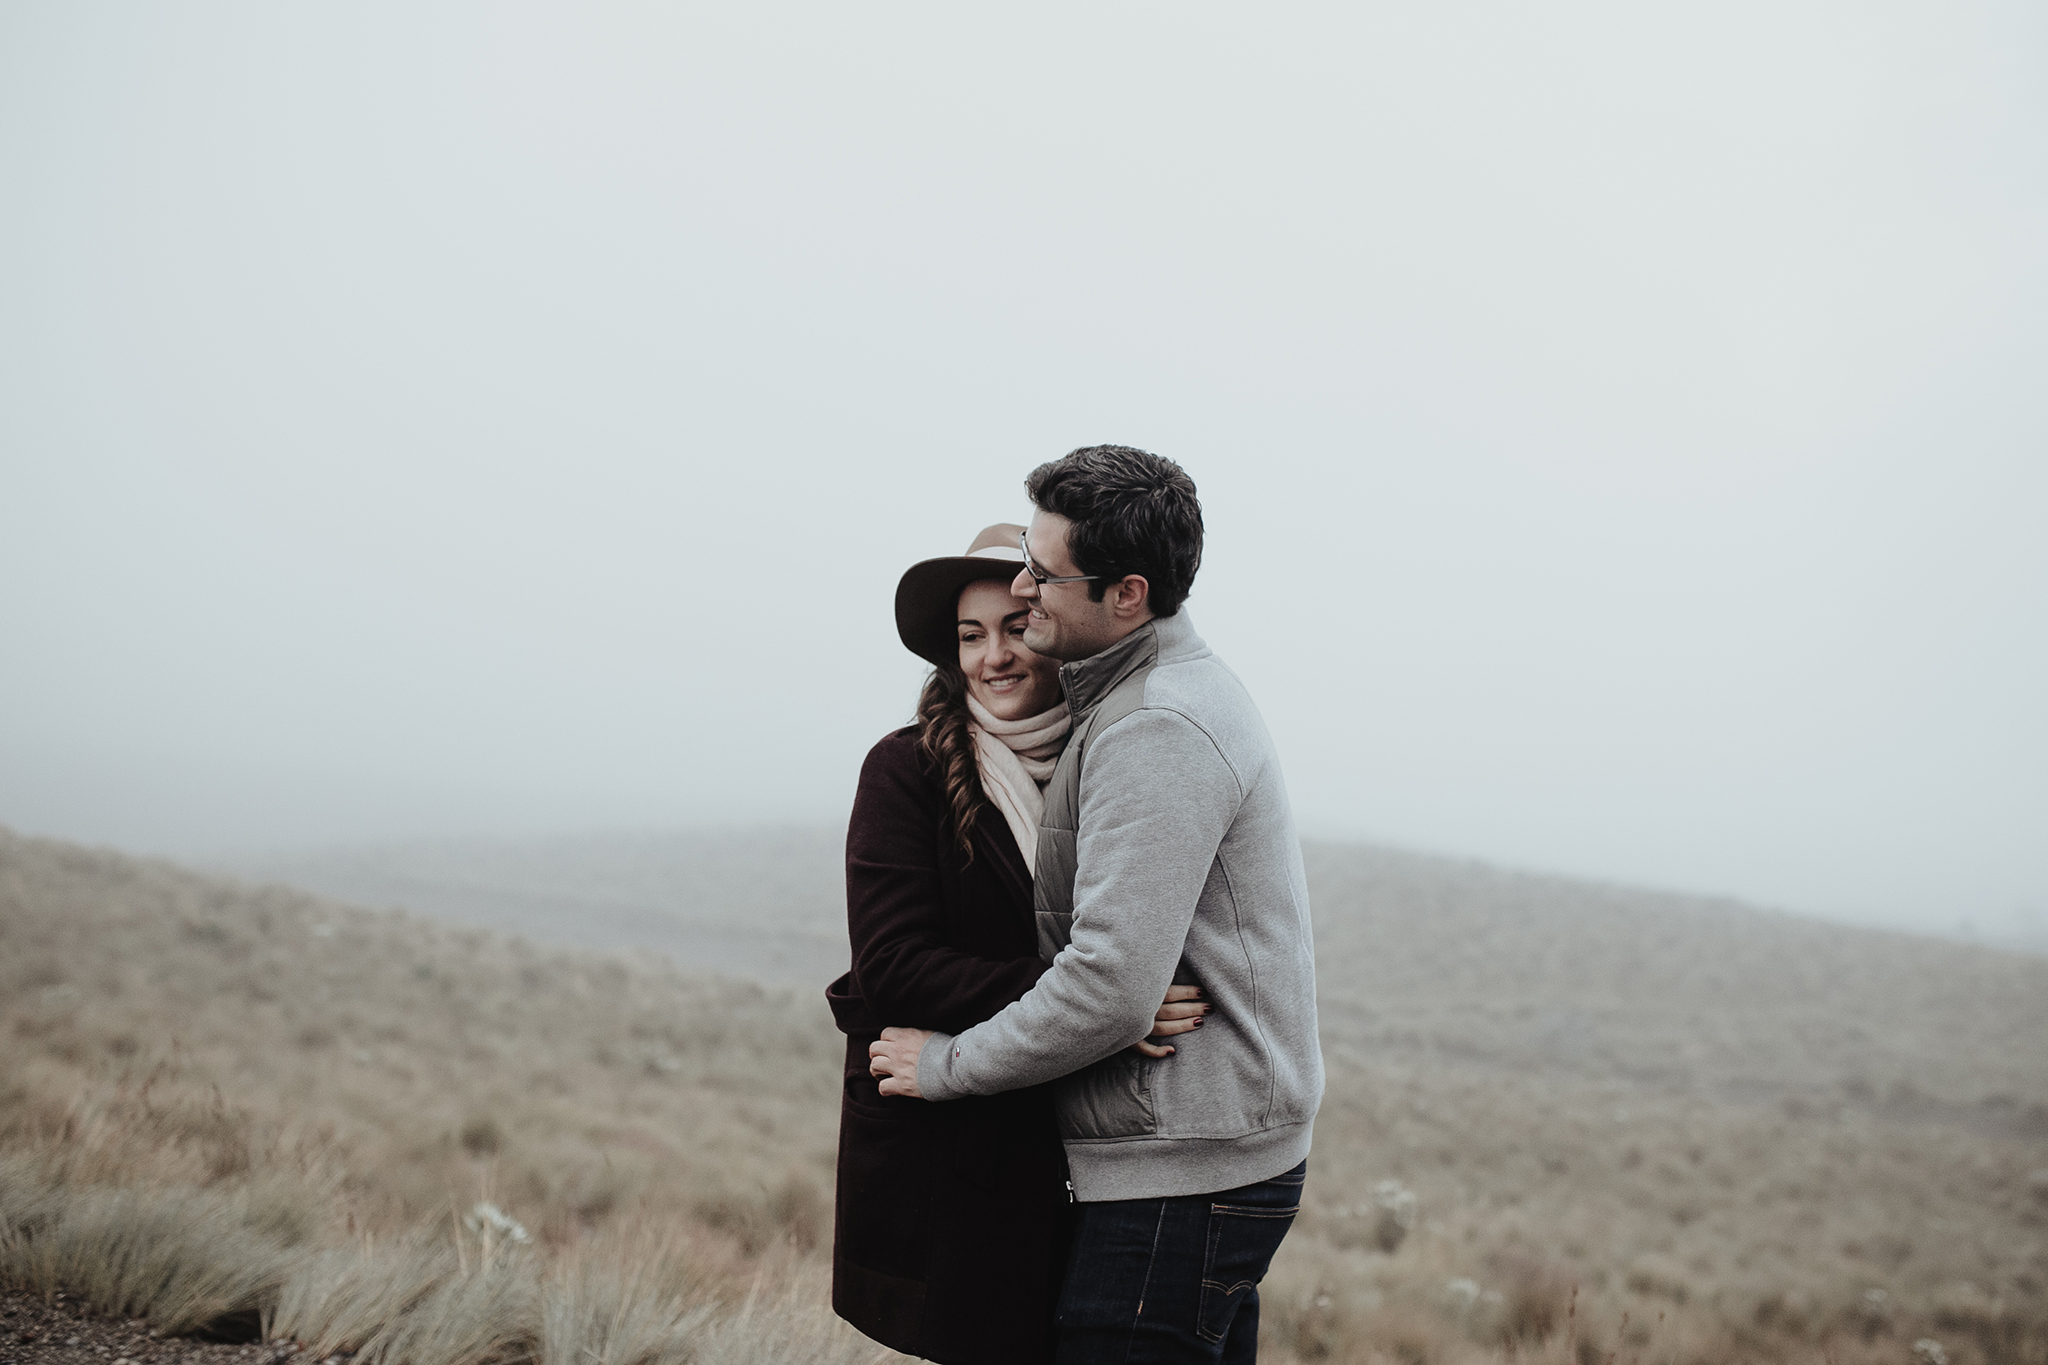 0015L&R_nevado_engagement_WeddingPhotography_Wedding_Boda_WeddingDestination_BodasYucatan.jpg